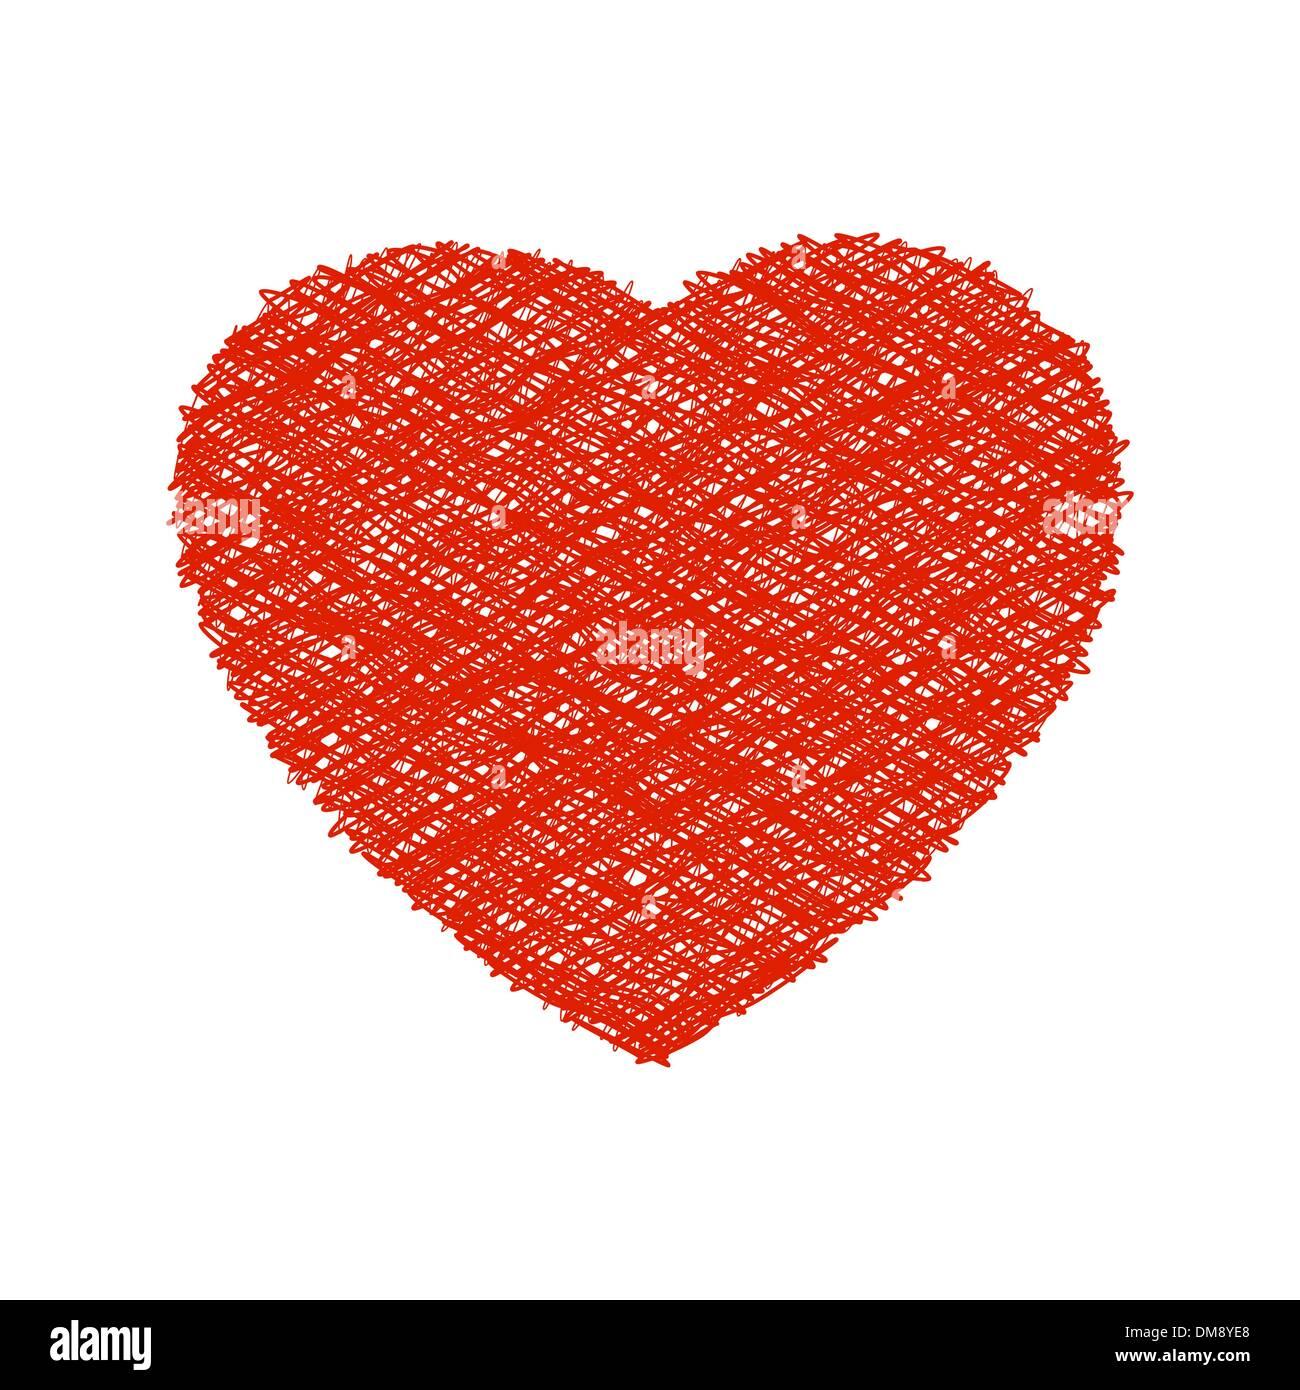 Weaving red heart. EPS 8 - Stock Vector